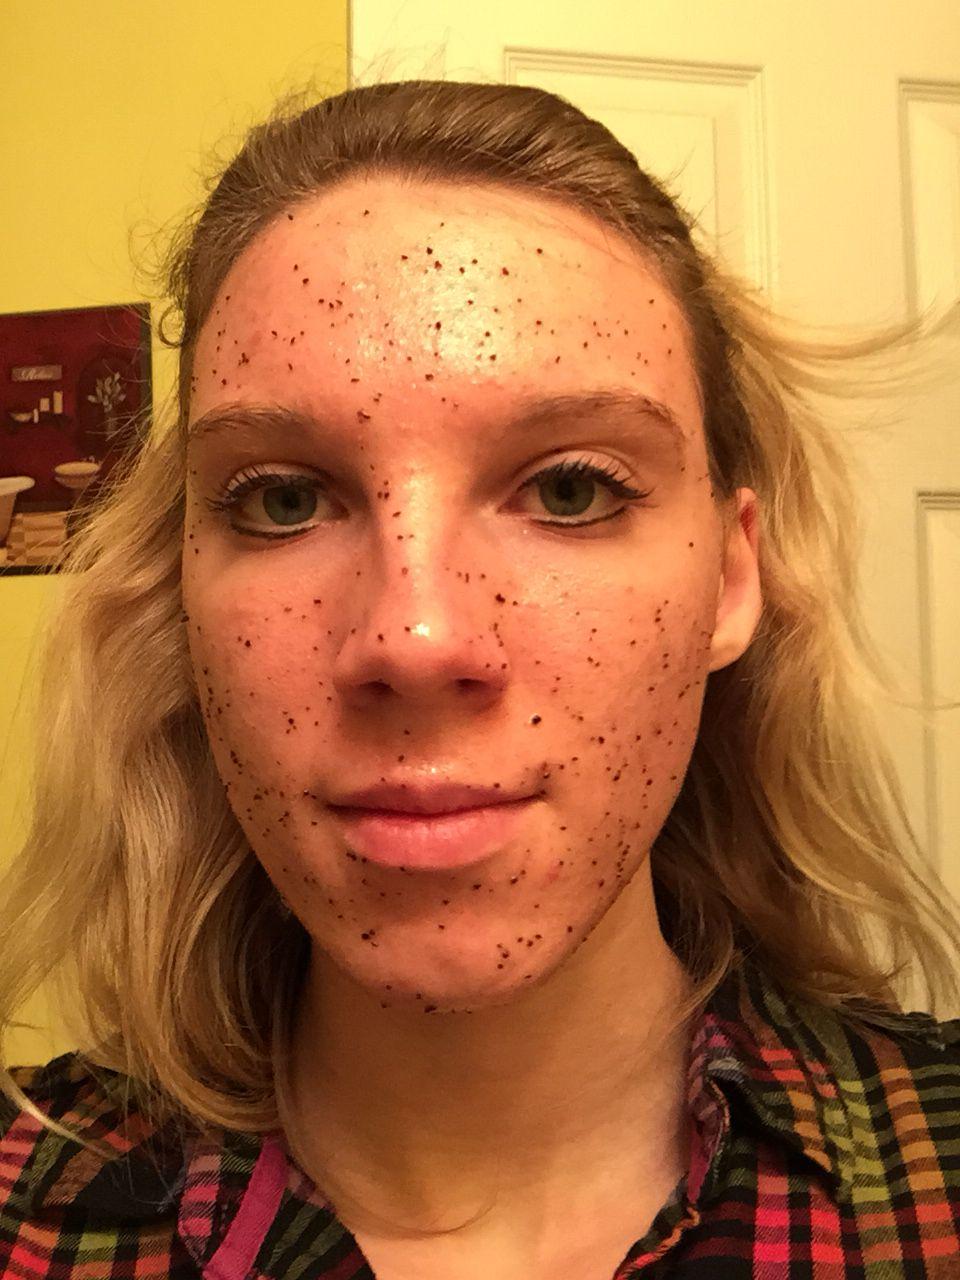 acne treatment: coffee grounds: applecider vinegar: cinnamon:nutmeg